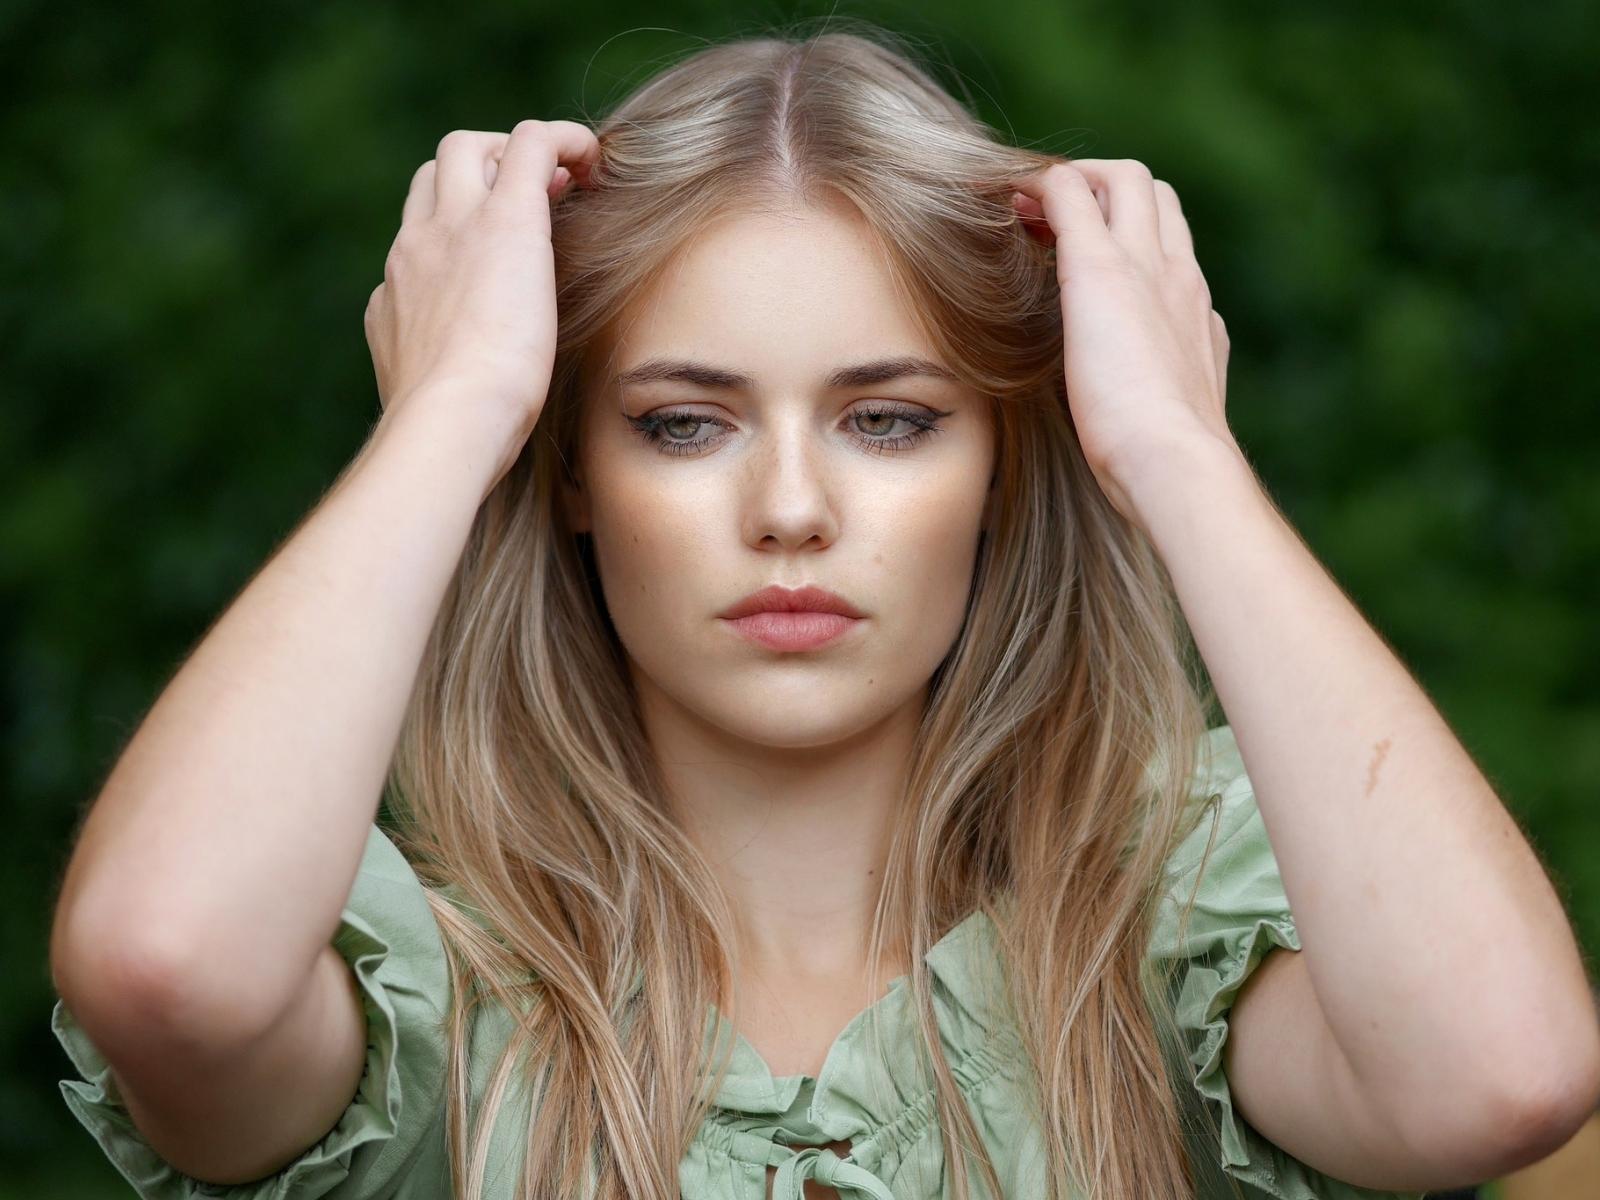 Pretty woman, blonde, model, beautiful, 1600x1200 wallpaper